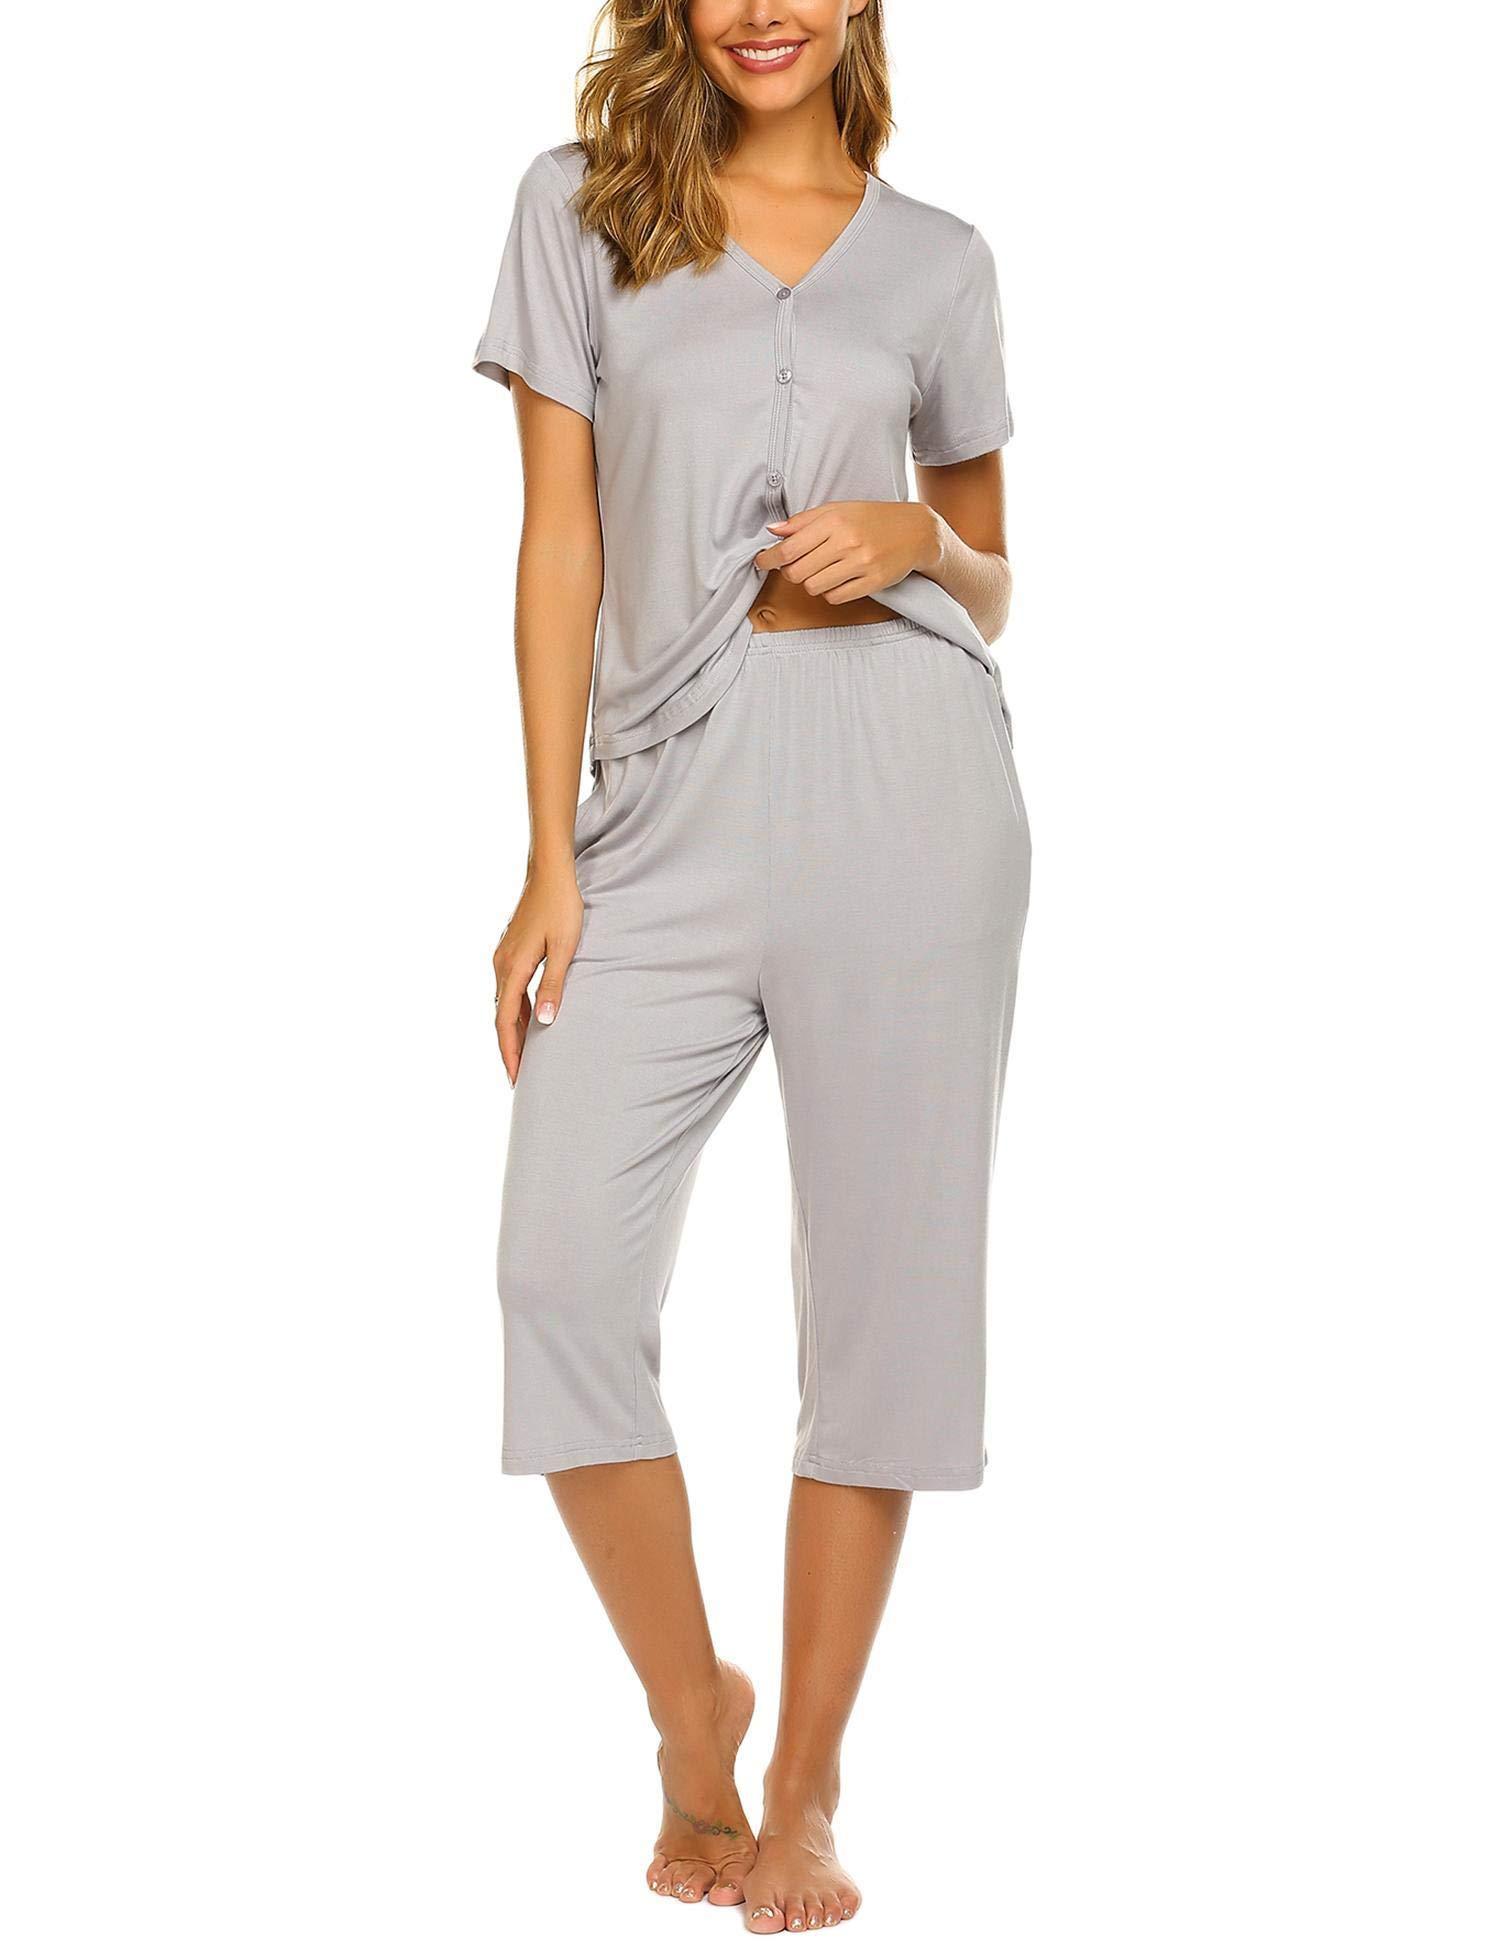 Ekouaer Pajamas Set Short Sleeve Sleepwear Womens Button Up Top and Capri Pajama PJ Set S-XXL